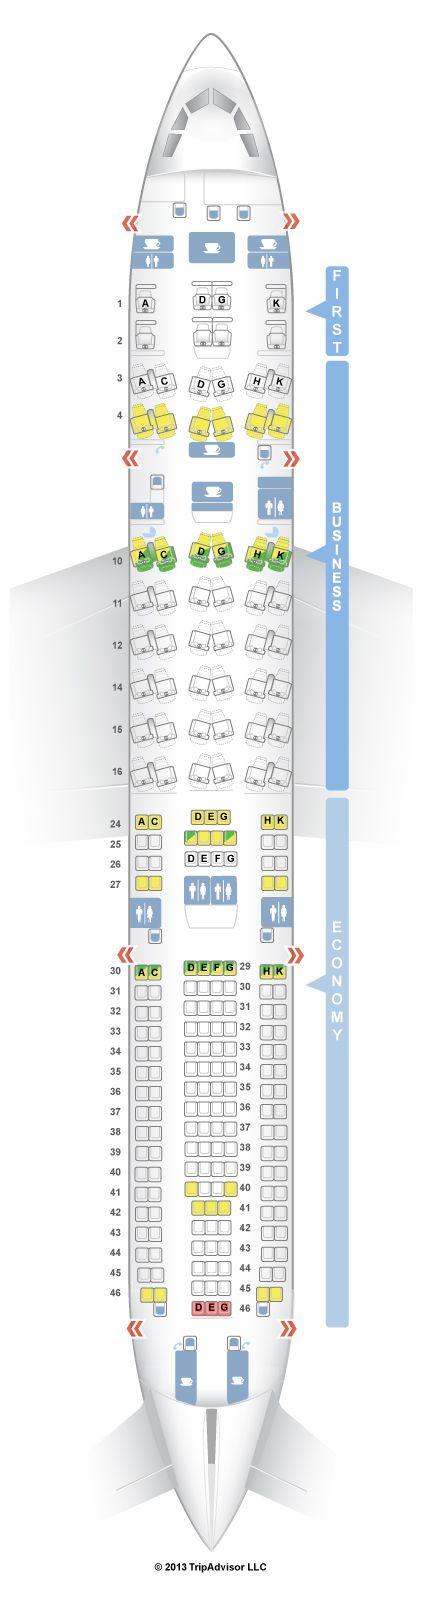 SeatGuru Seat Map Lufthansa Airbus A330-300 (333) V1 - Denver to Munich